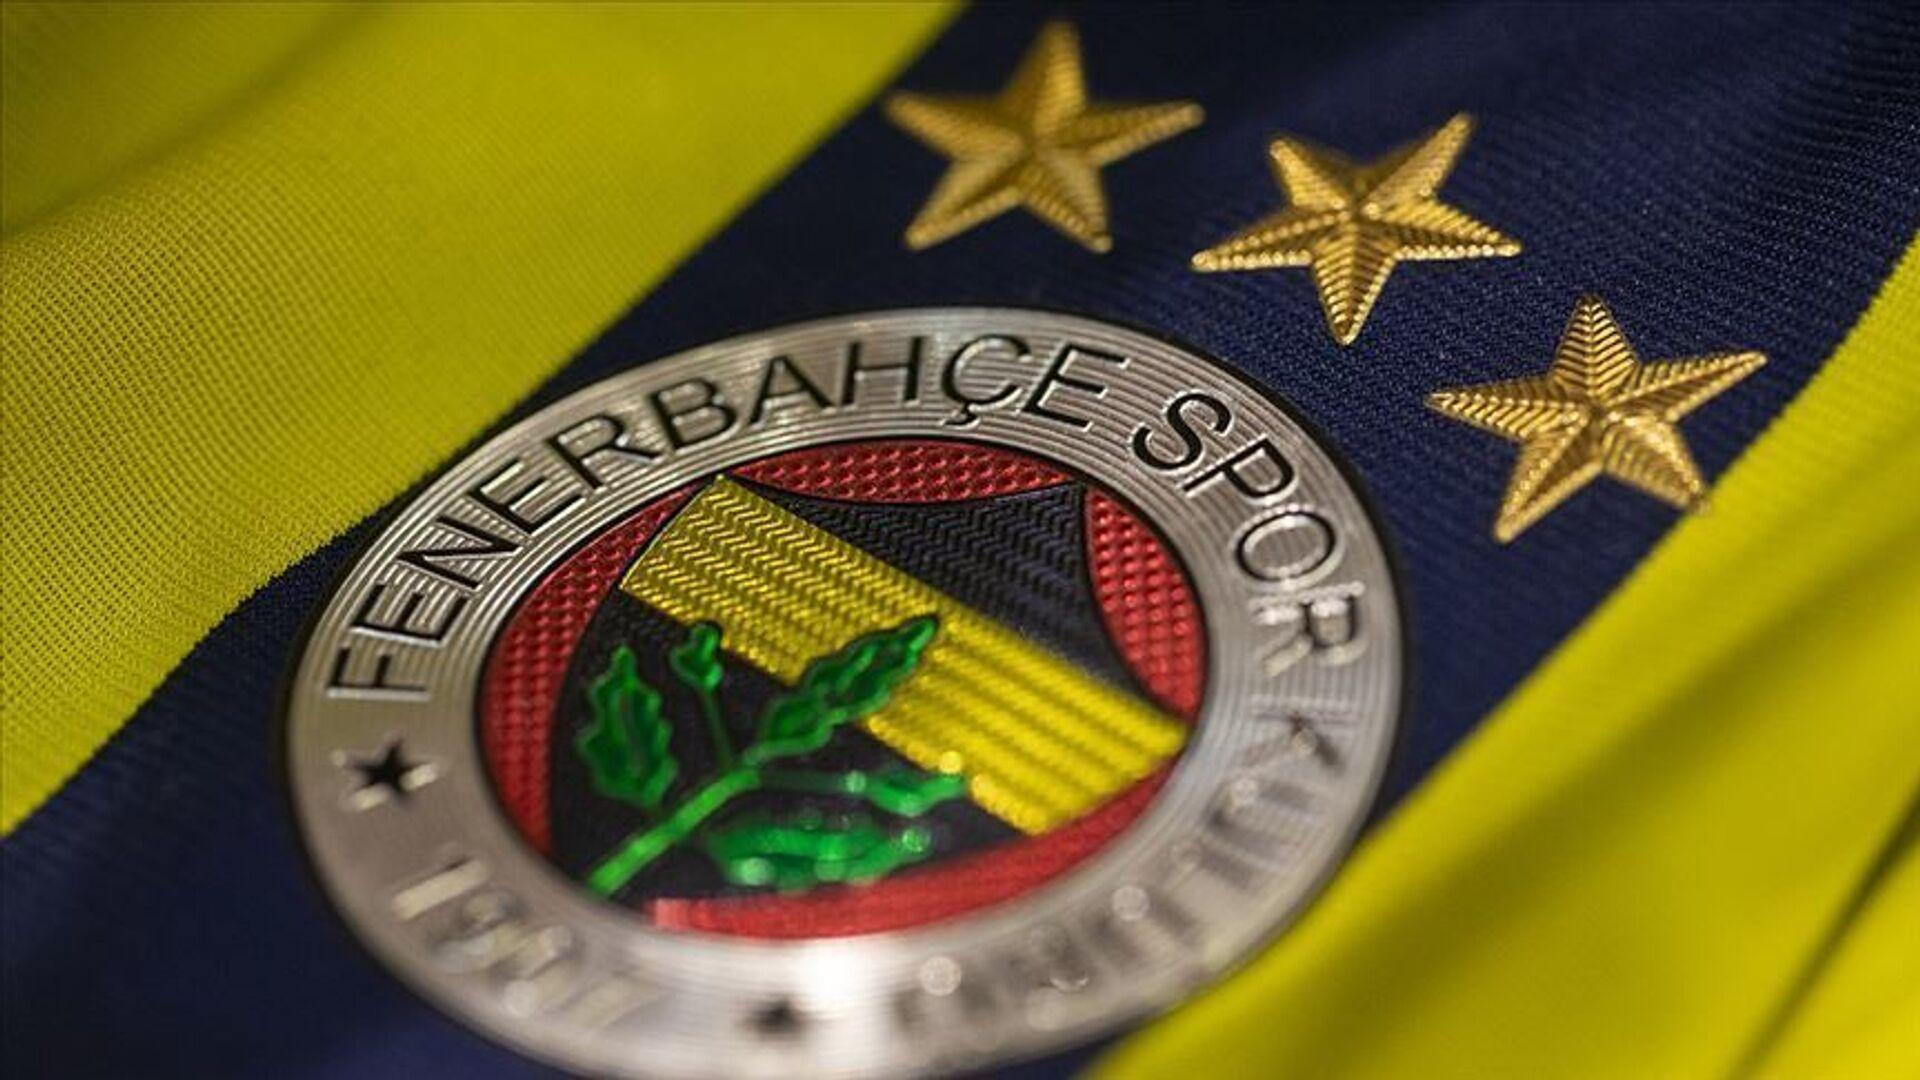 Fenerbahçe arma, forma, logo - Sputnik Türkiye, 1920, 30.07.2021